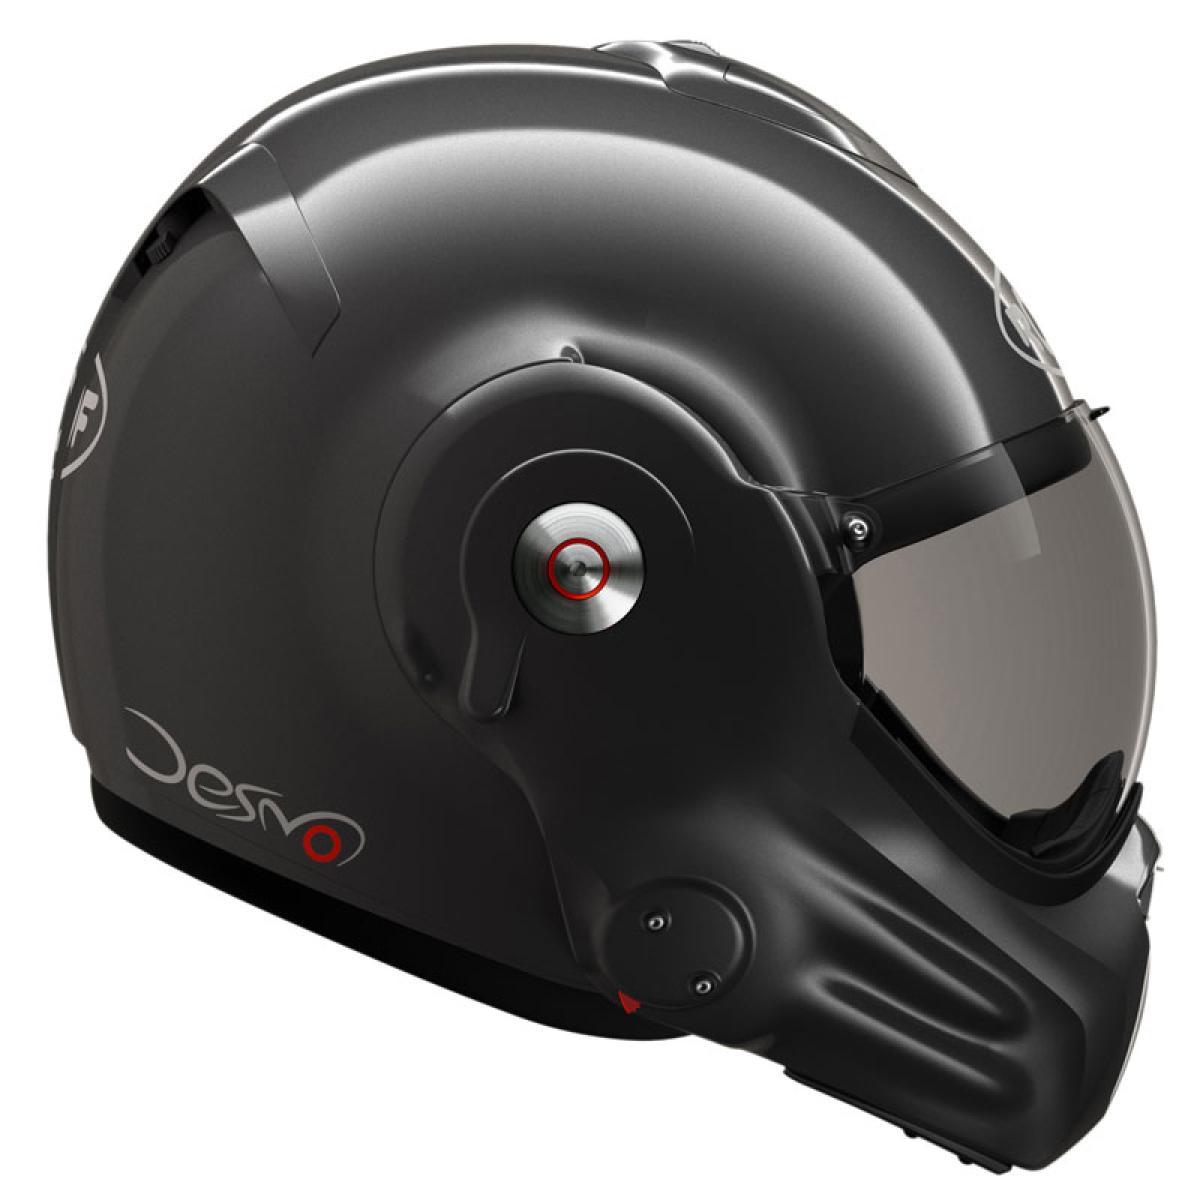 casque moto modulable roof desmo ro32 new generation titane. Black Bedroom Furniture Sets. Home Design Ideas